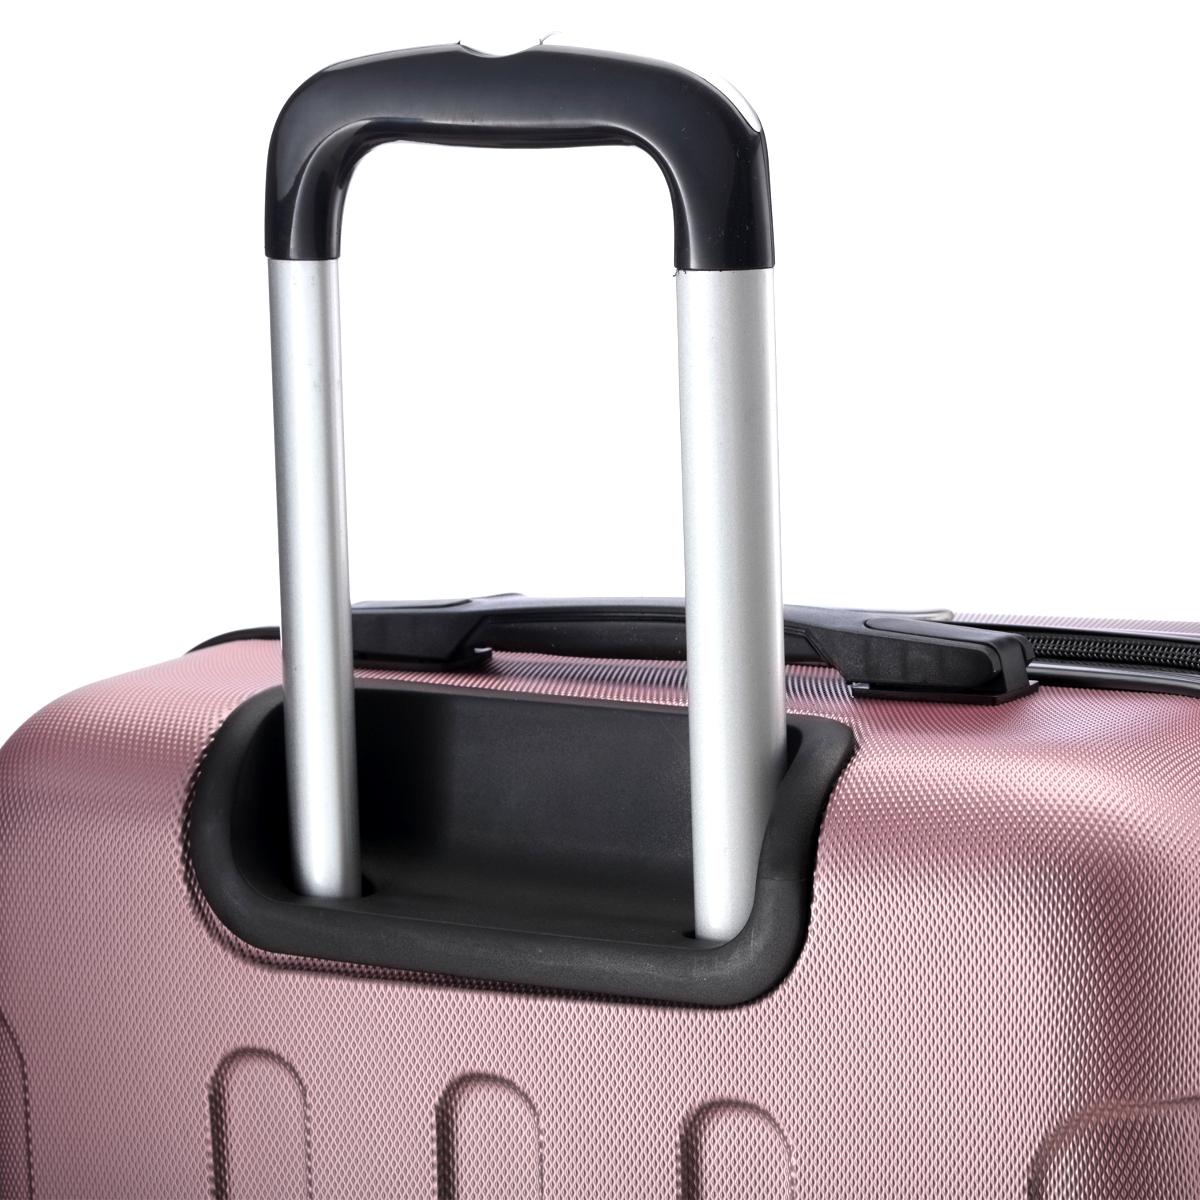 Koffer-Flexot-2045-Hartschalenkoffer-Trolley-Kofferset-Reisekoffer-M-L-XL-Set Indexbild 28